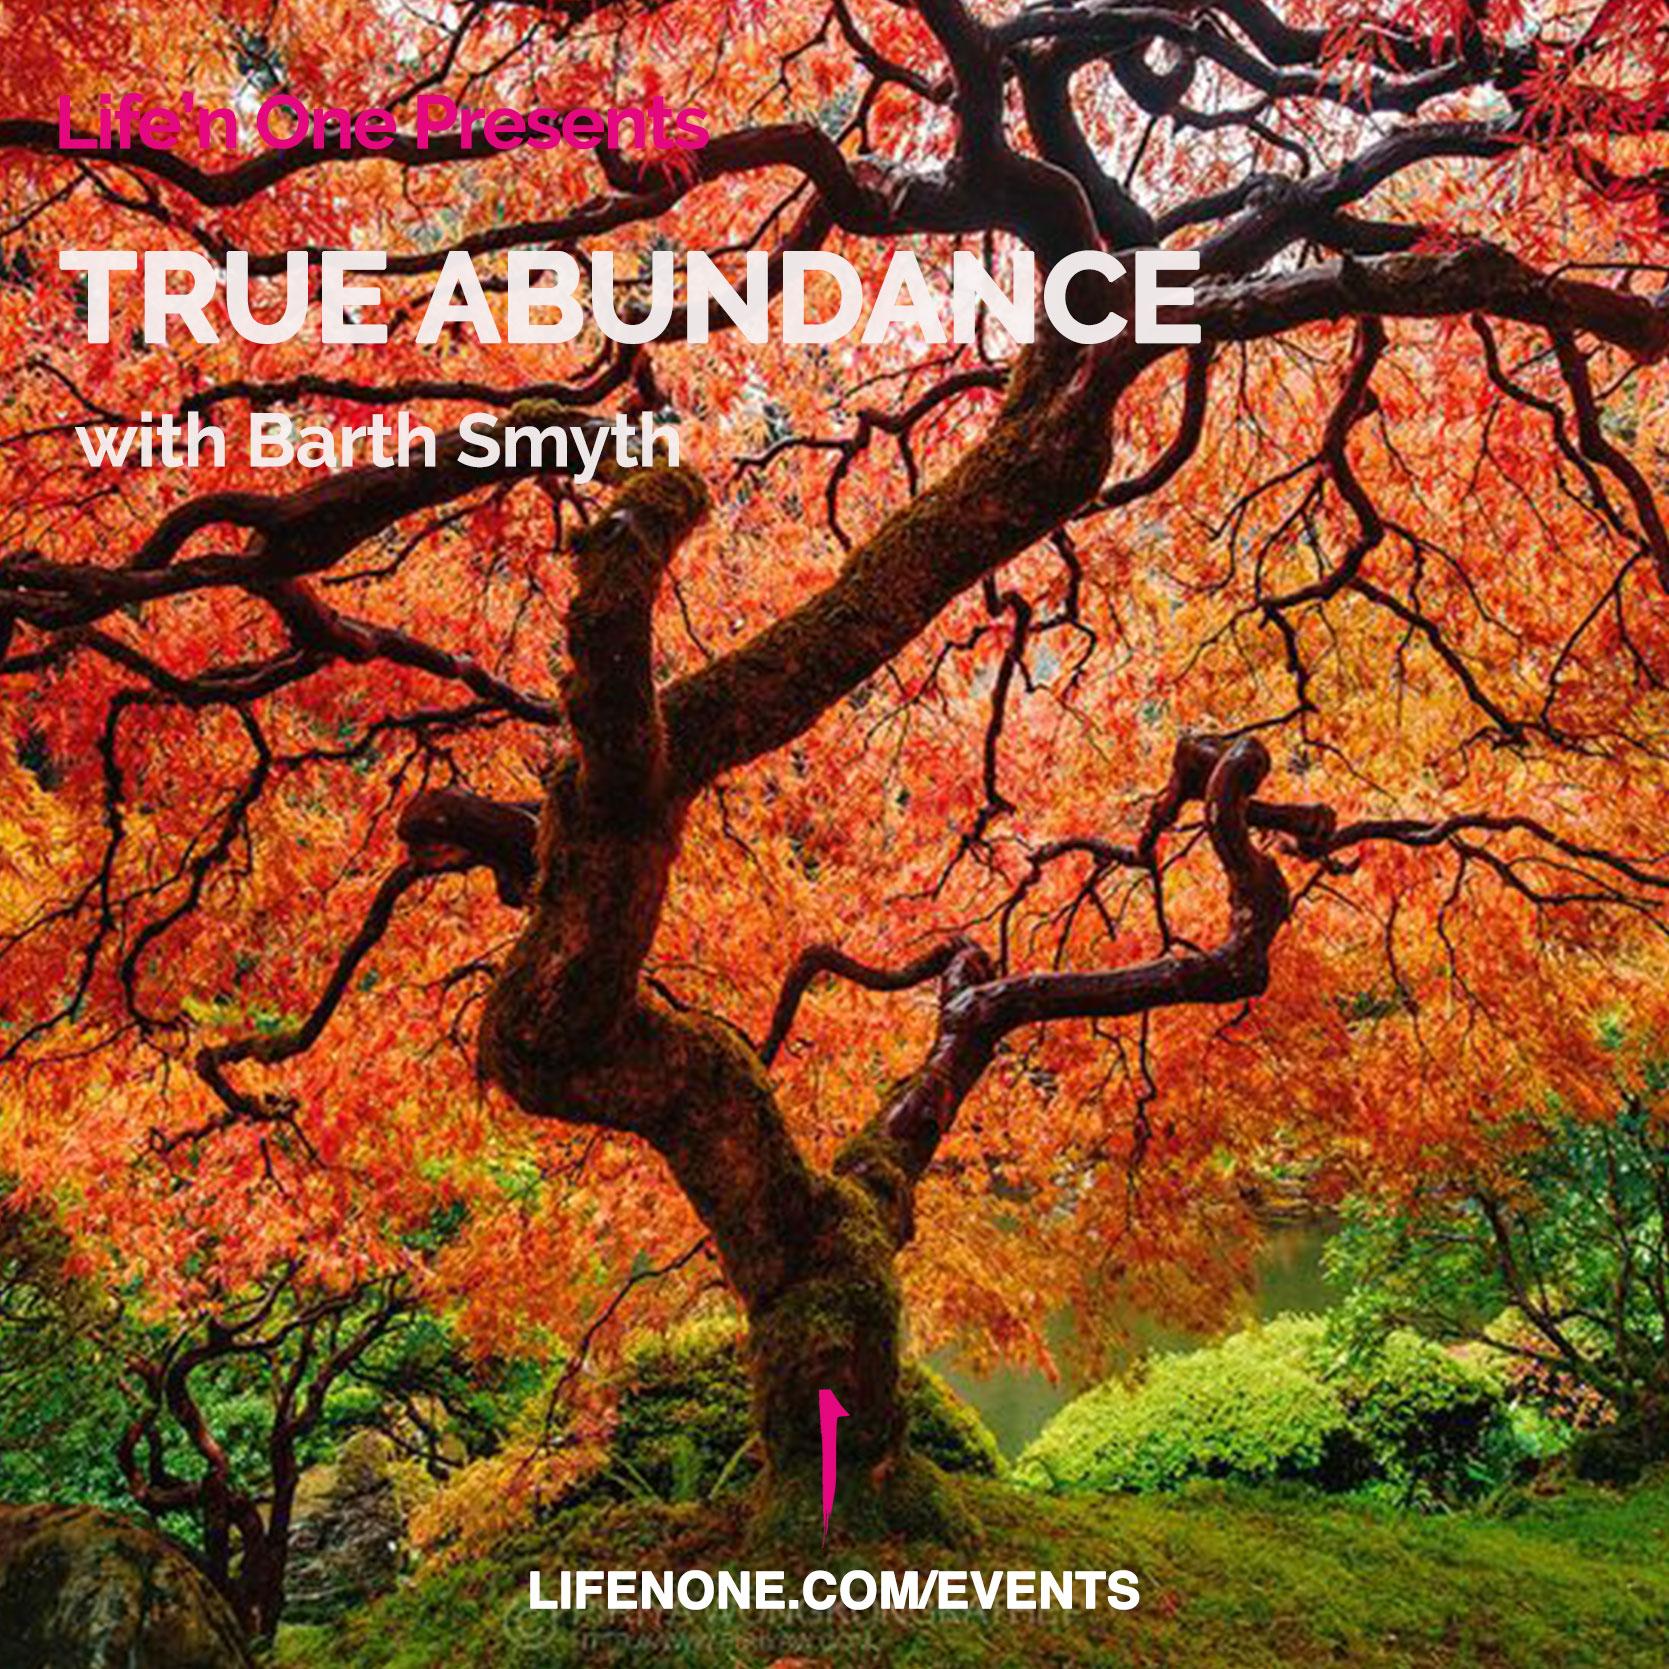 191122-true-abundance-with-bart-smyth-flyer.jpg